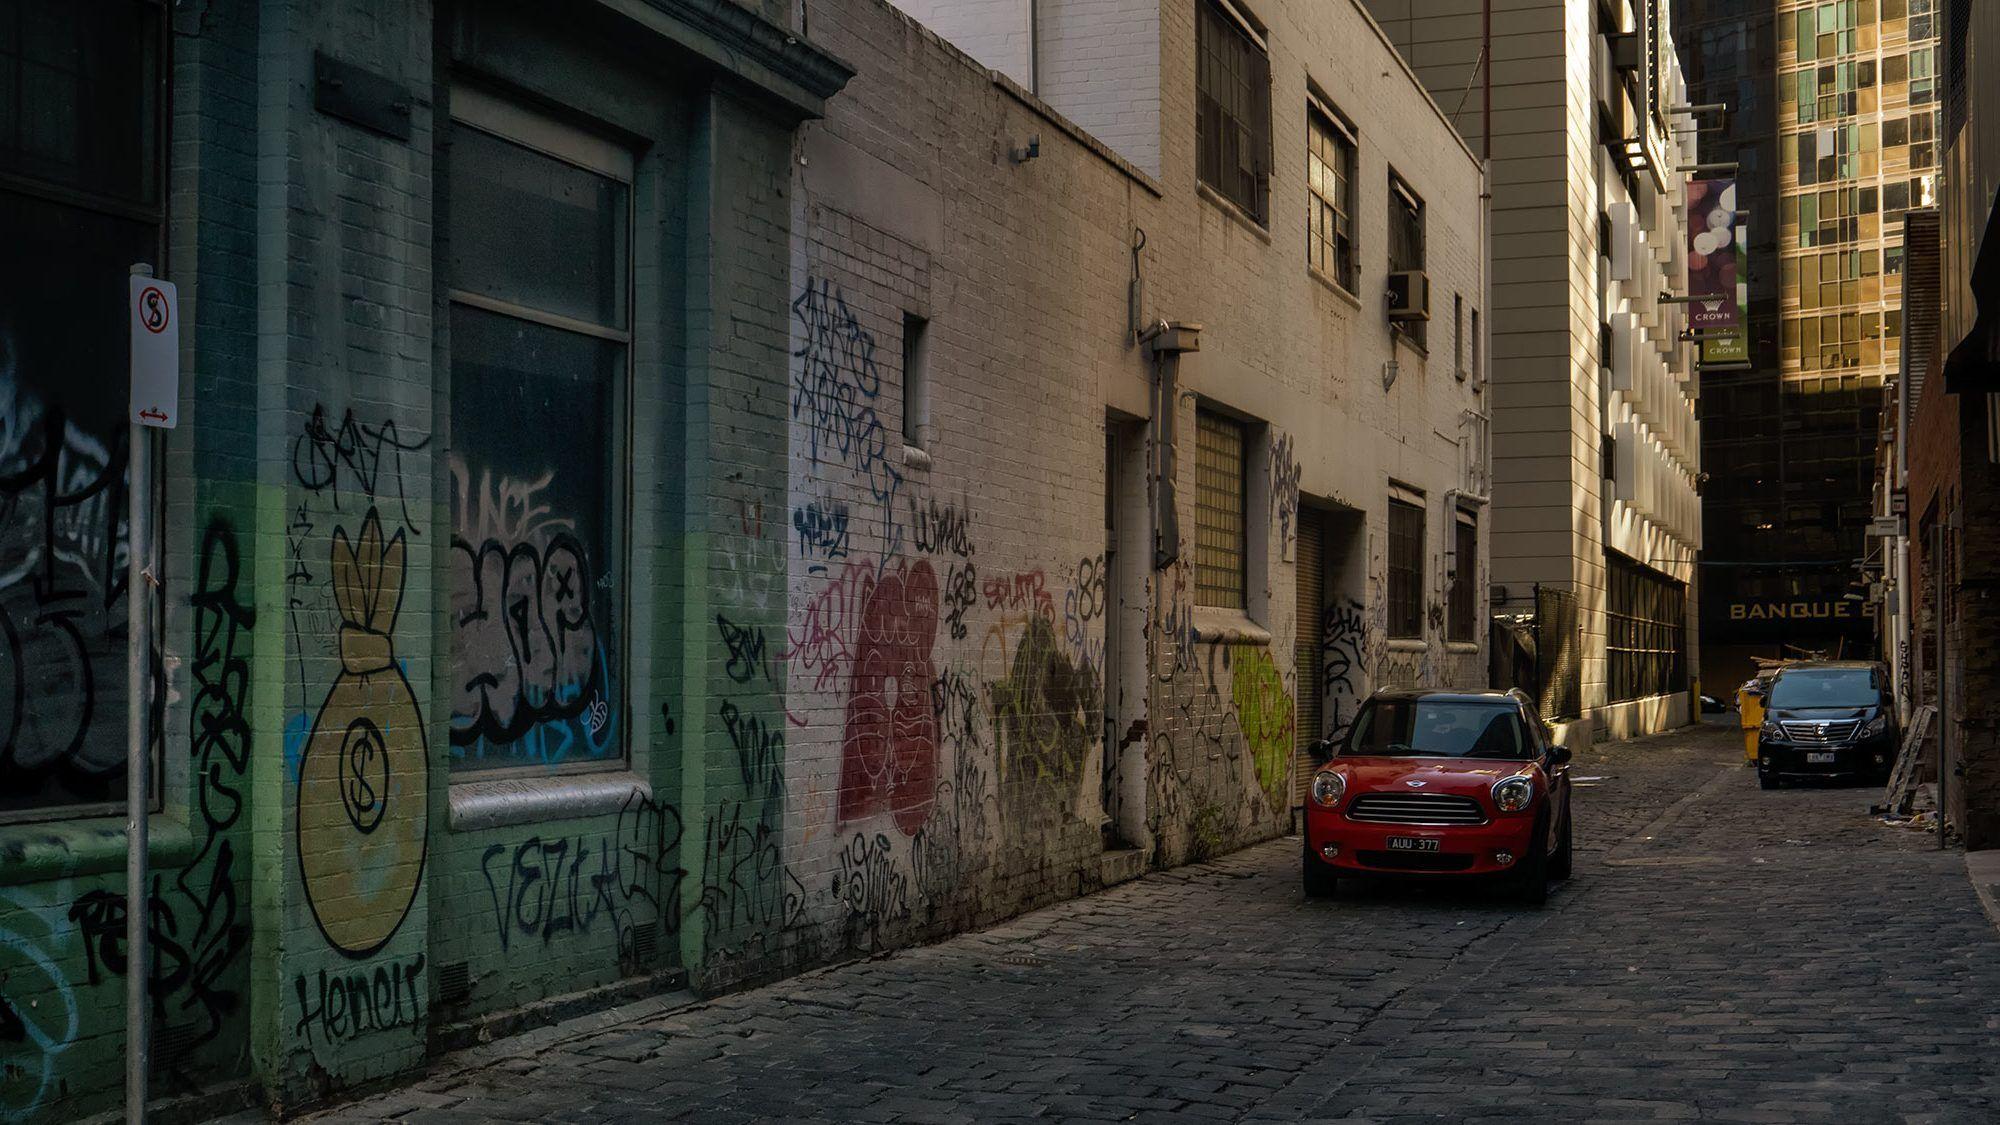 gentrification in progress